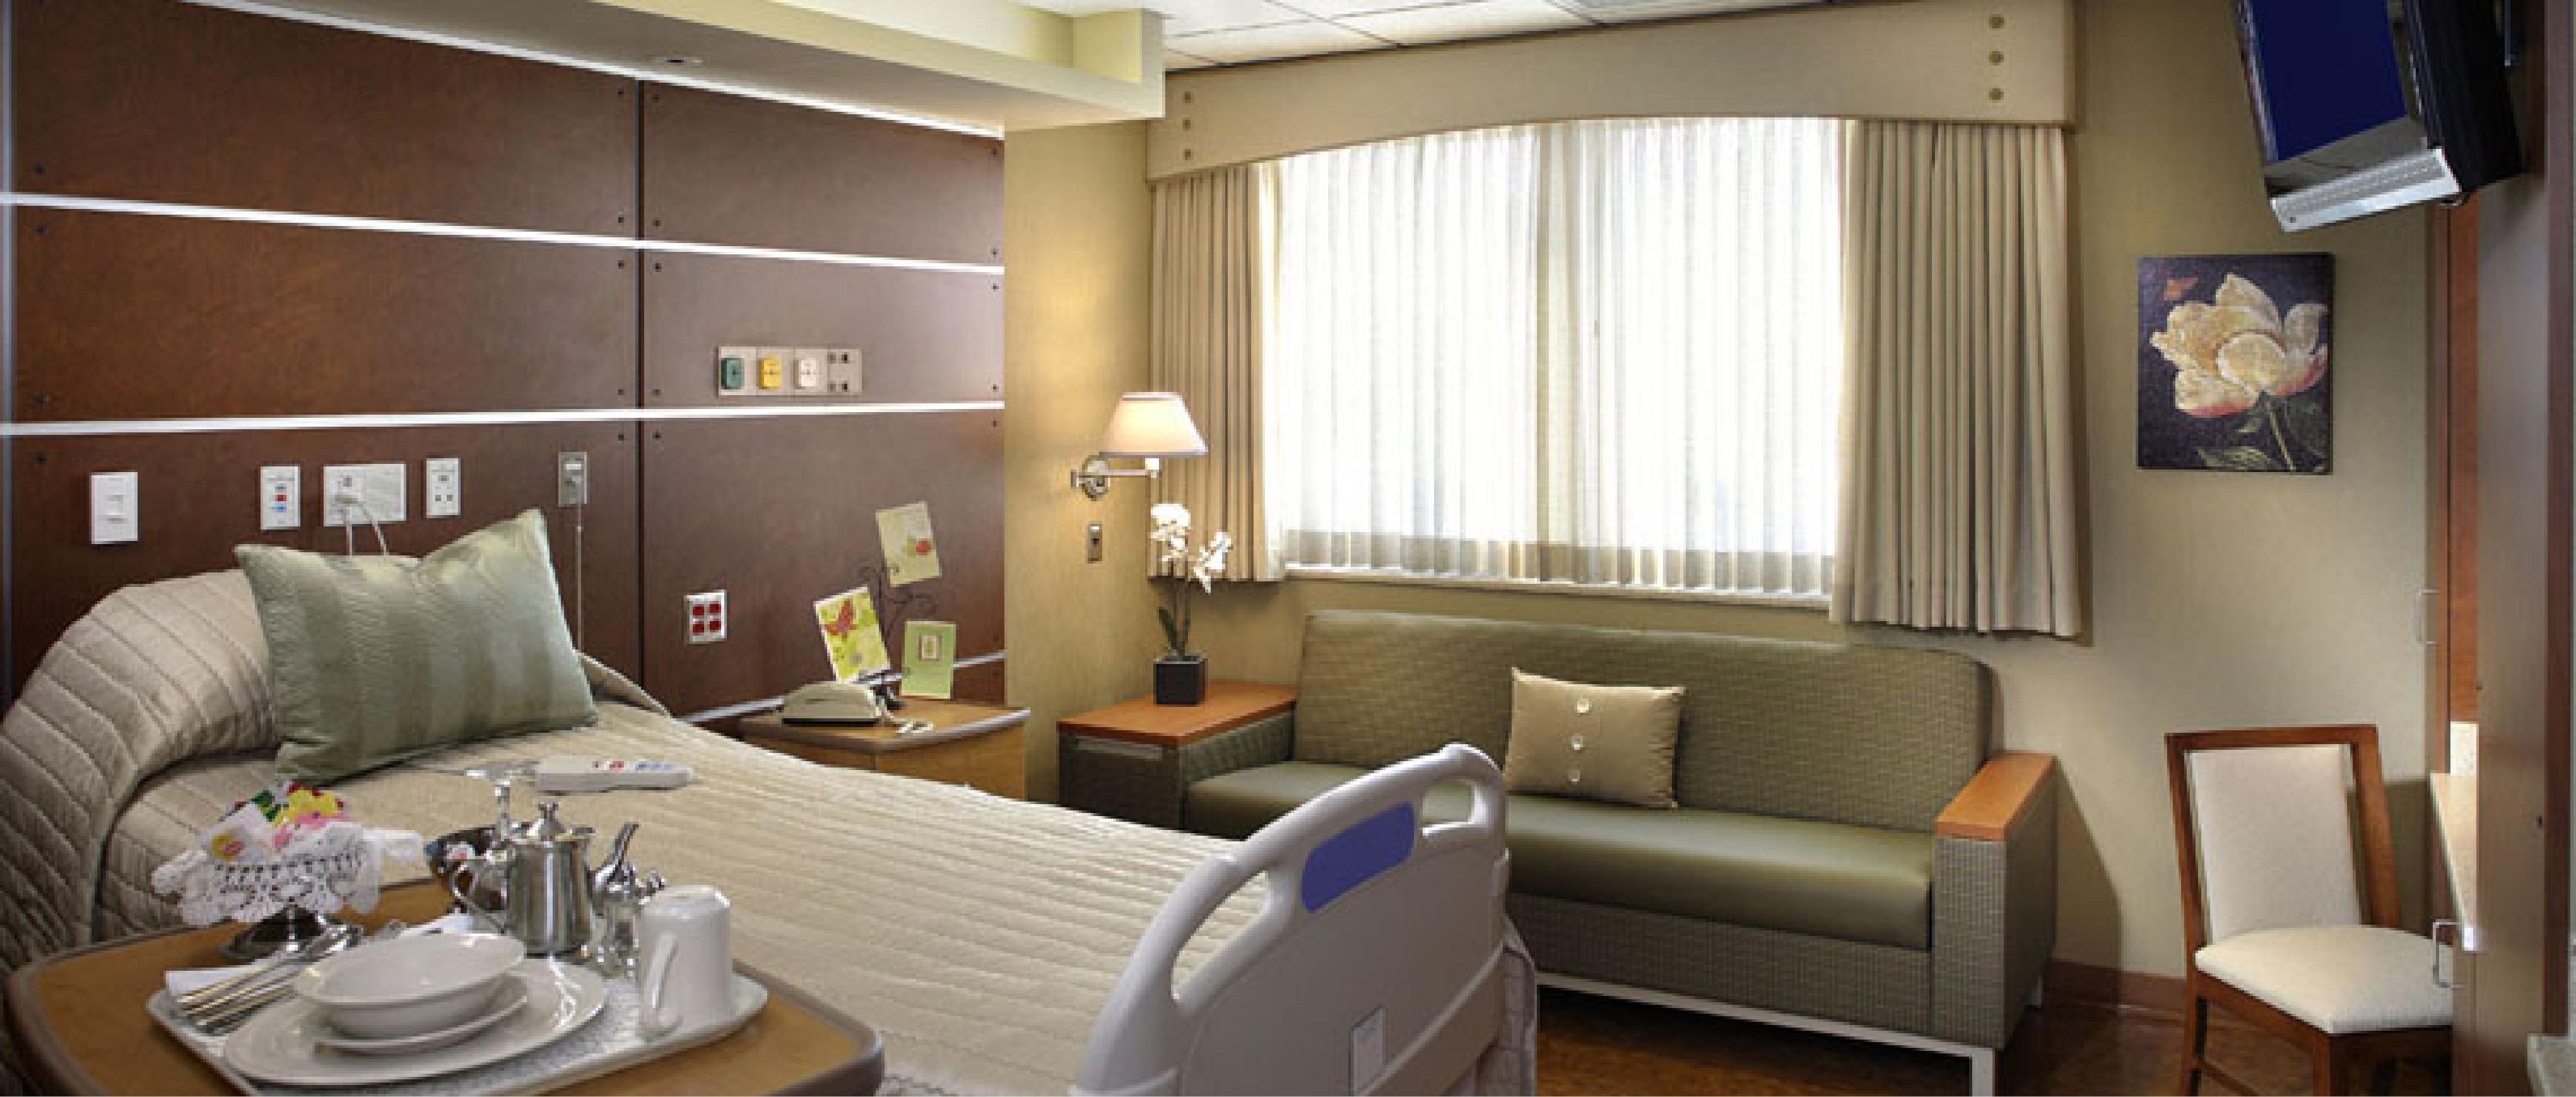 Kindred Healthcare Hospital